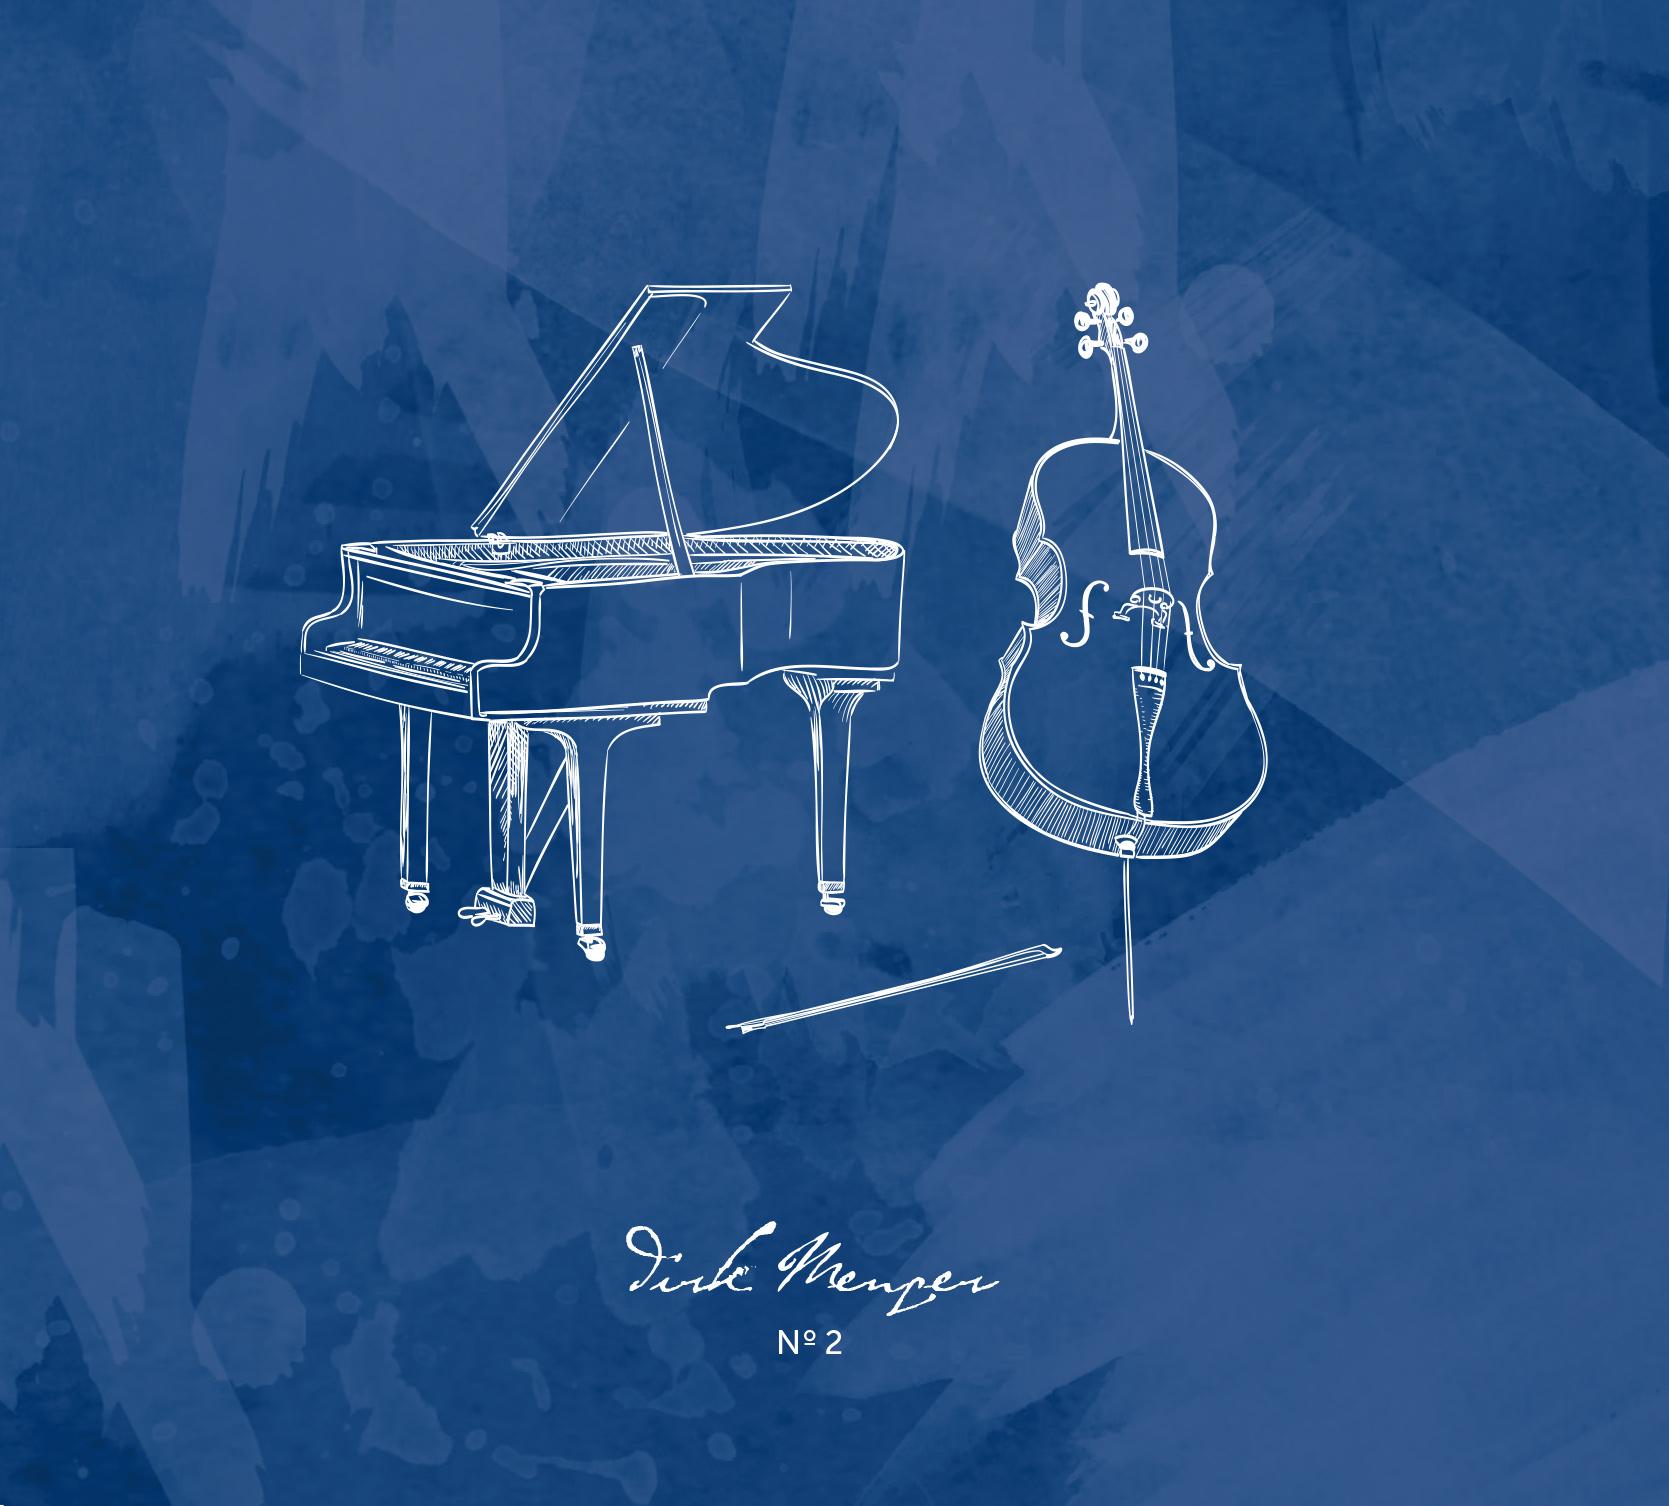 Dirk Menger; Album No. 2